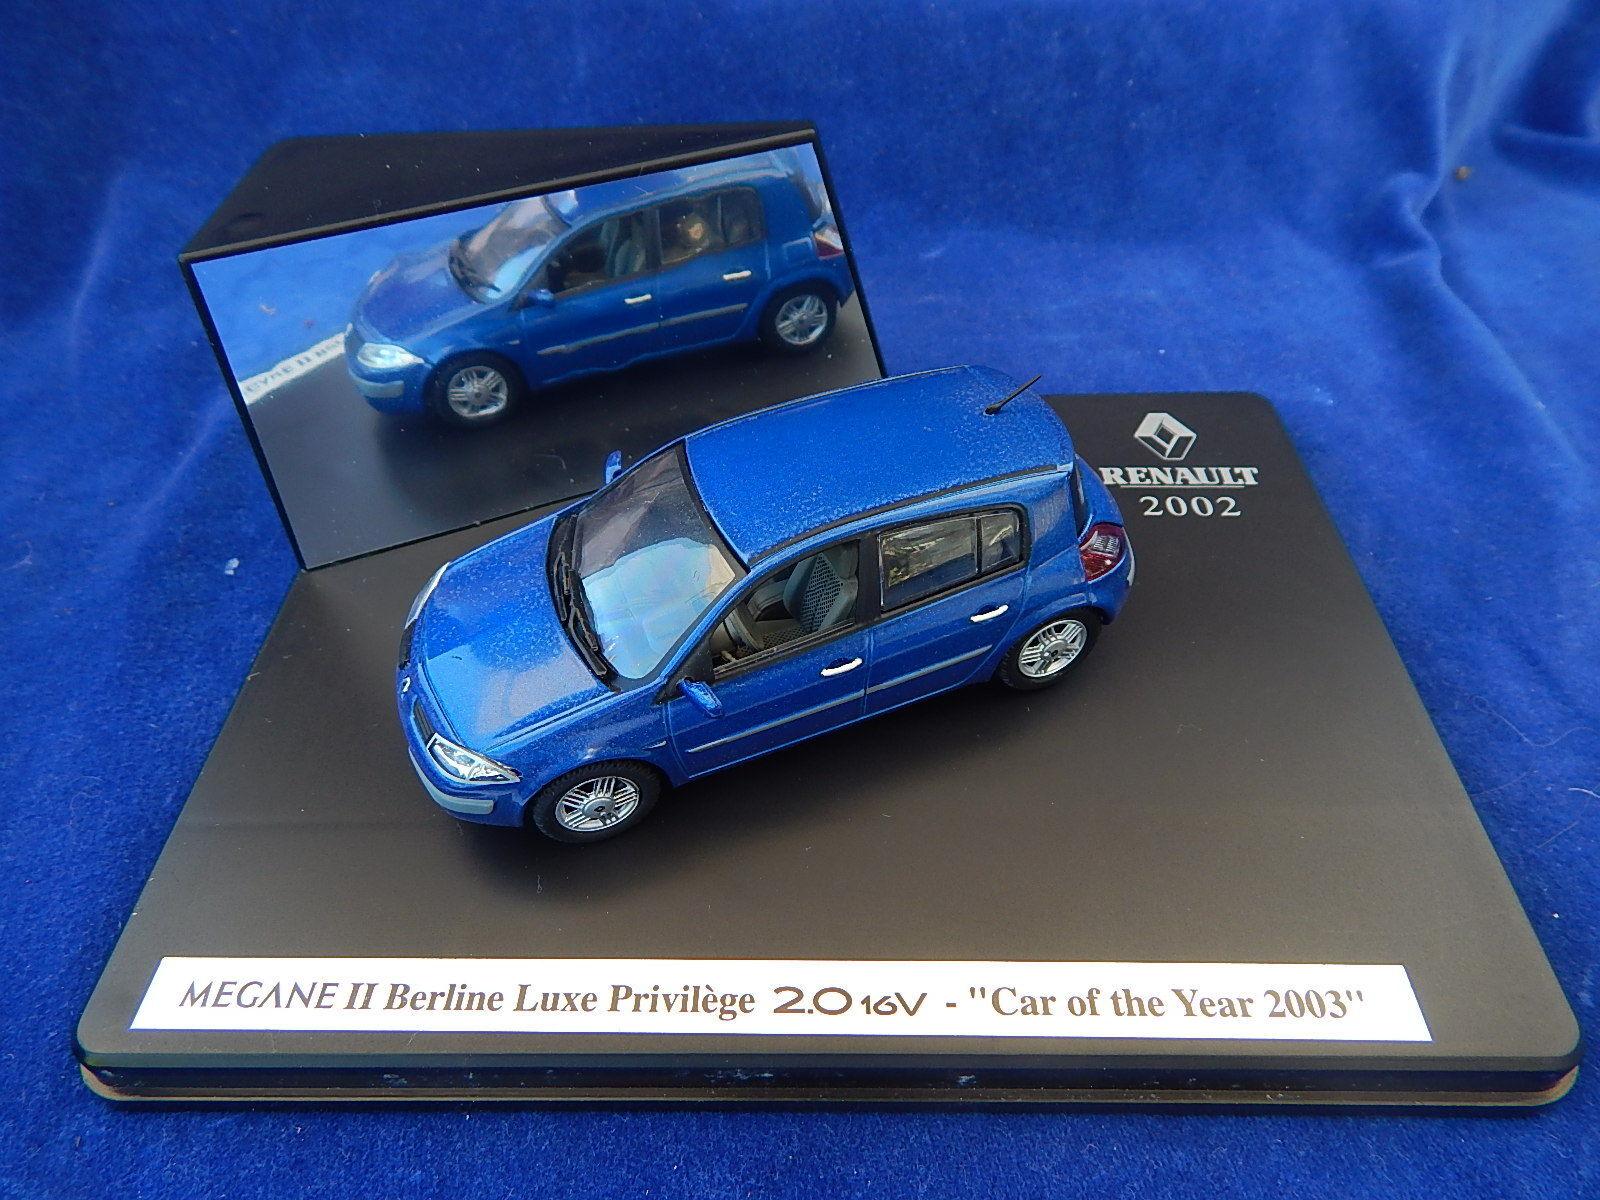 RENAULT - MEGANE II BERLINE LUXE PRIVILEGE 2.0 2.0 2.0 16V CAR OF THE YEAR 2003 c9f091